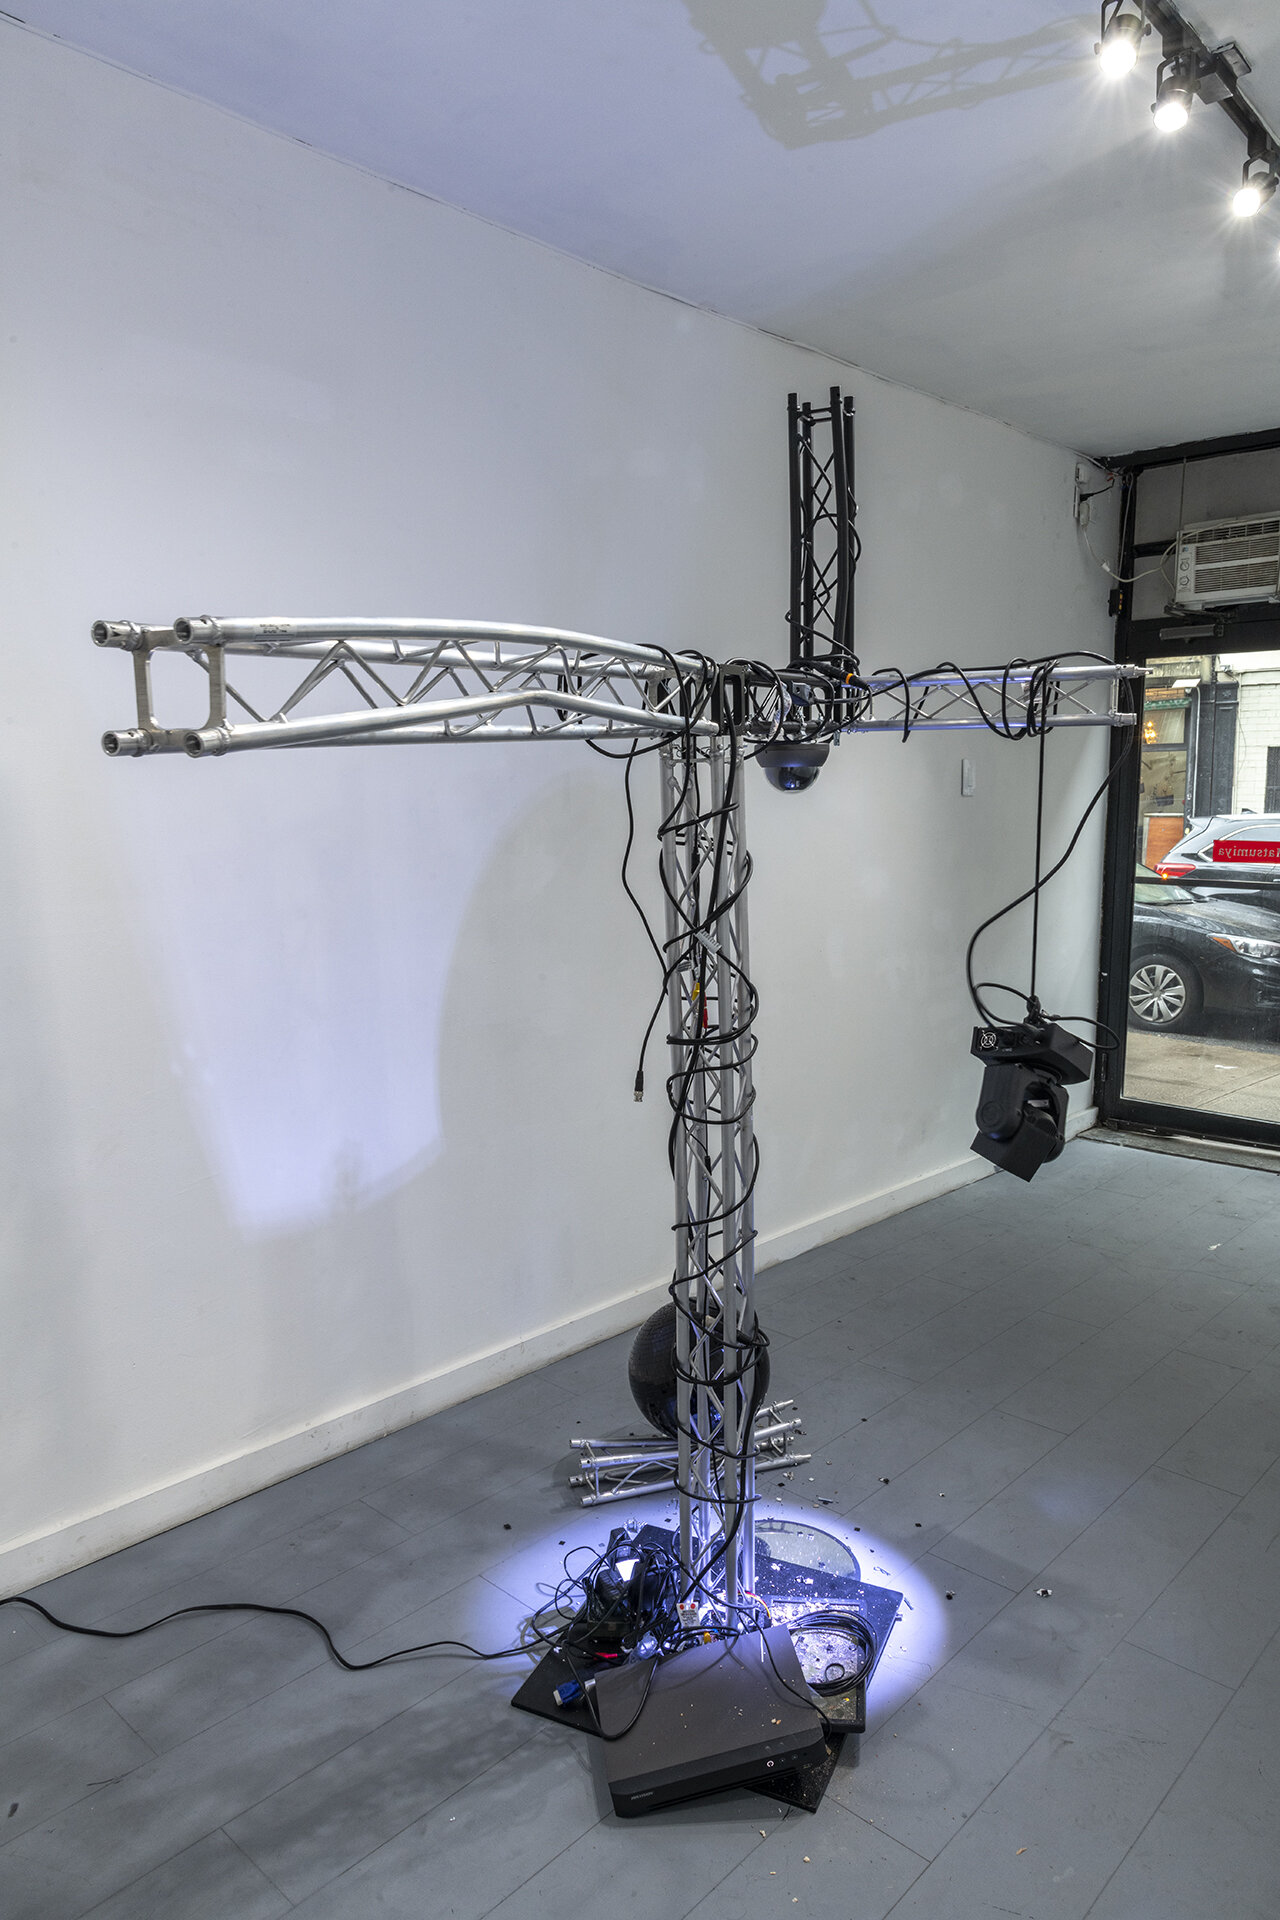 Craig Kalpakjian Damage Control, 2019  Lighting truss, surveillance mirror, security camera,  ADJ stage light, monitor, black mirrored ball, detritus 84 x 74 x 42 inches